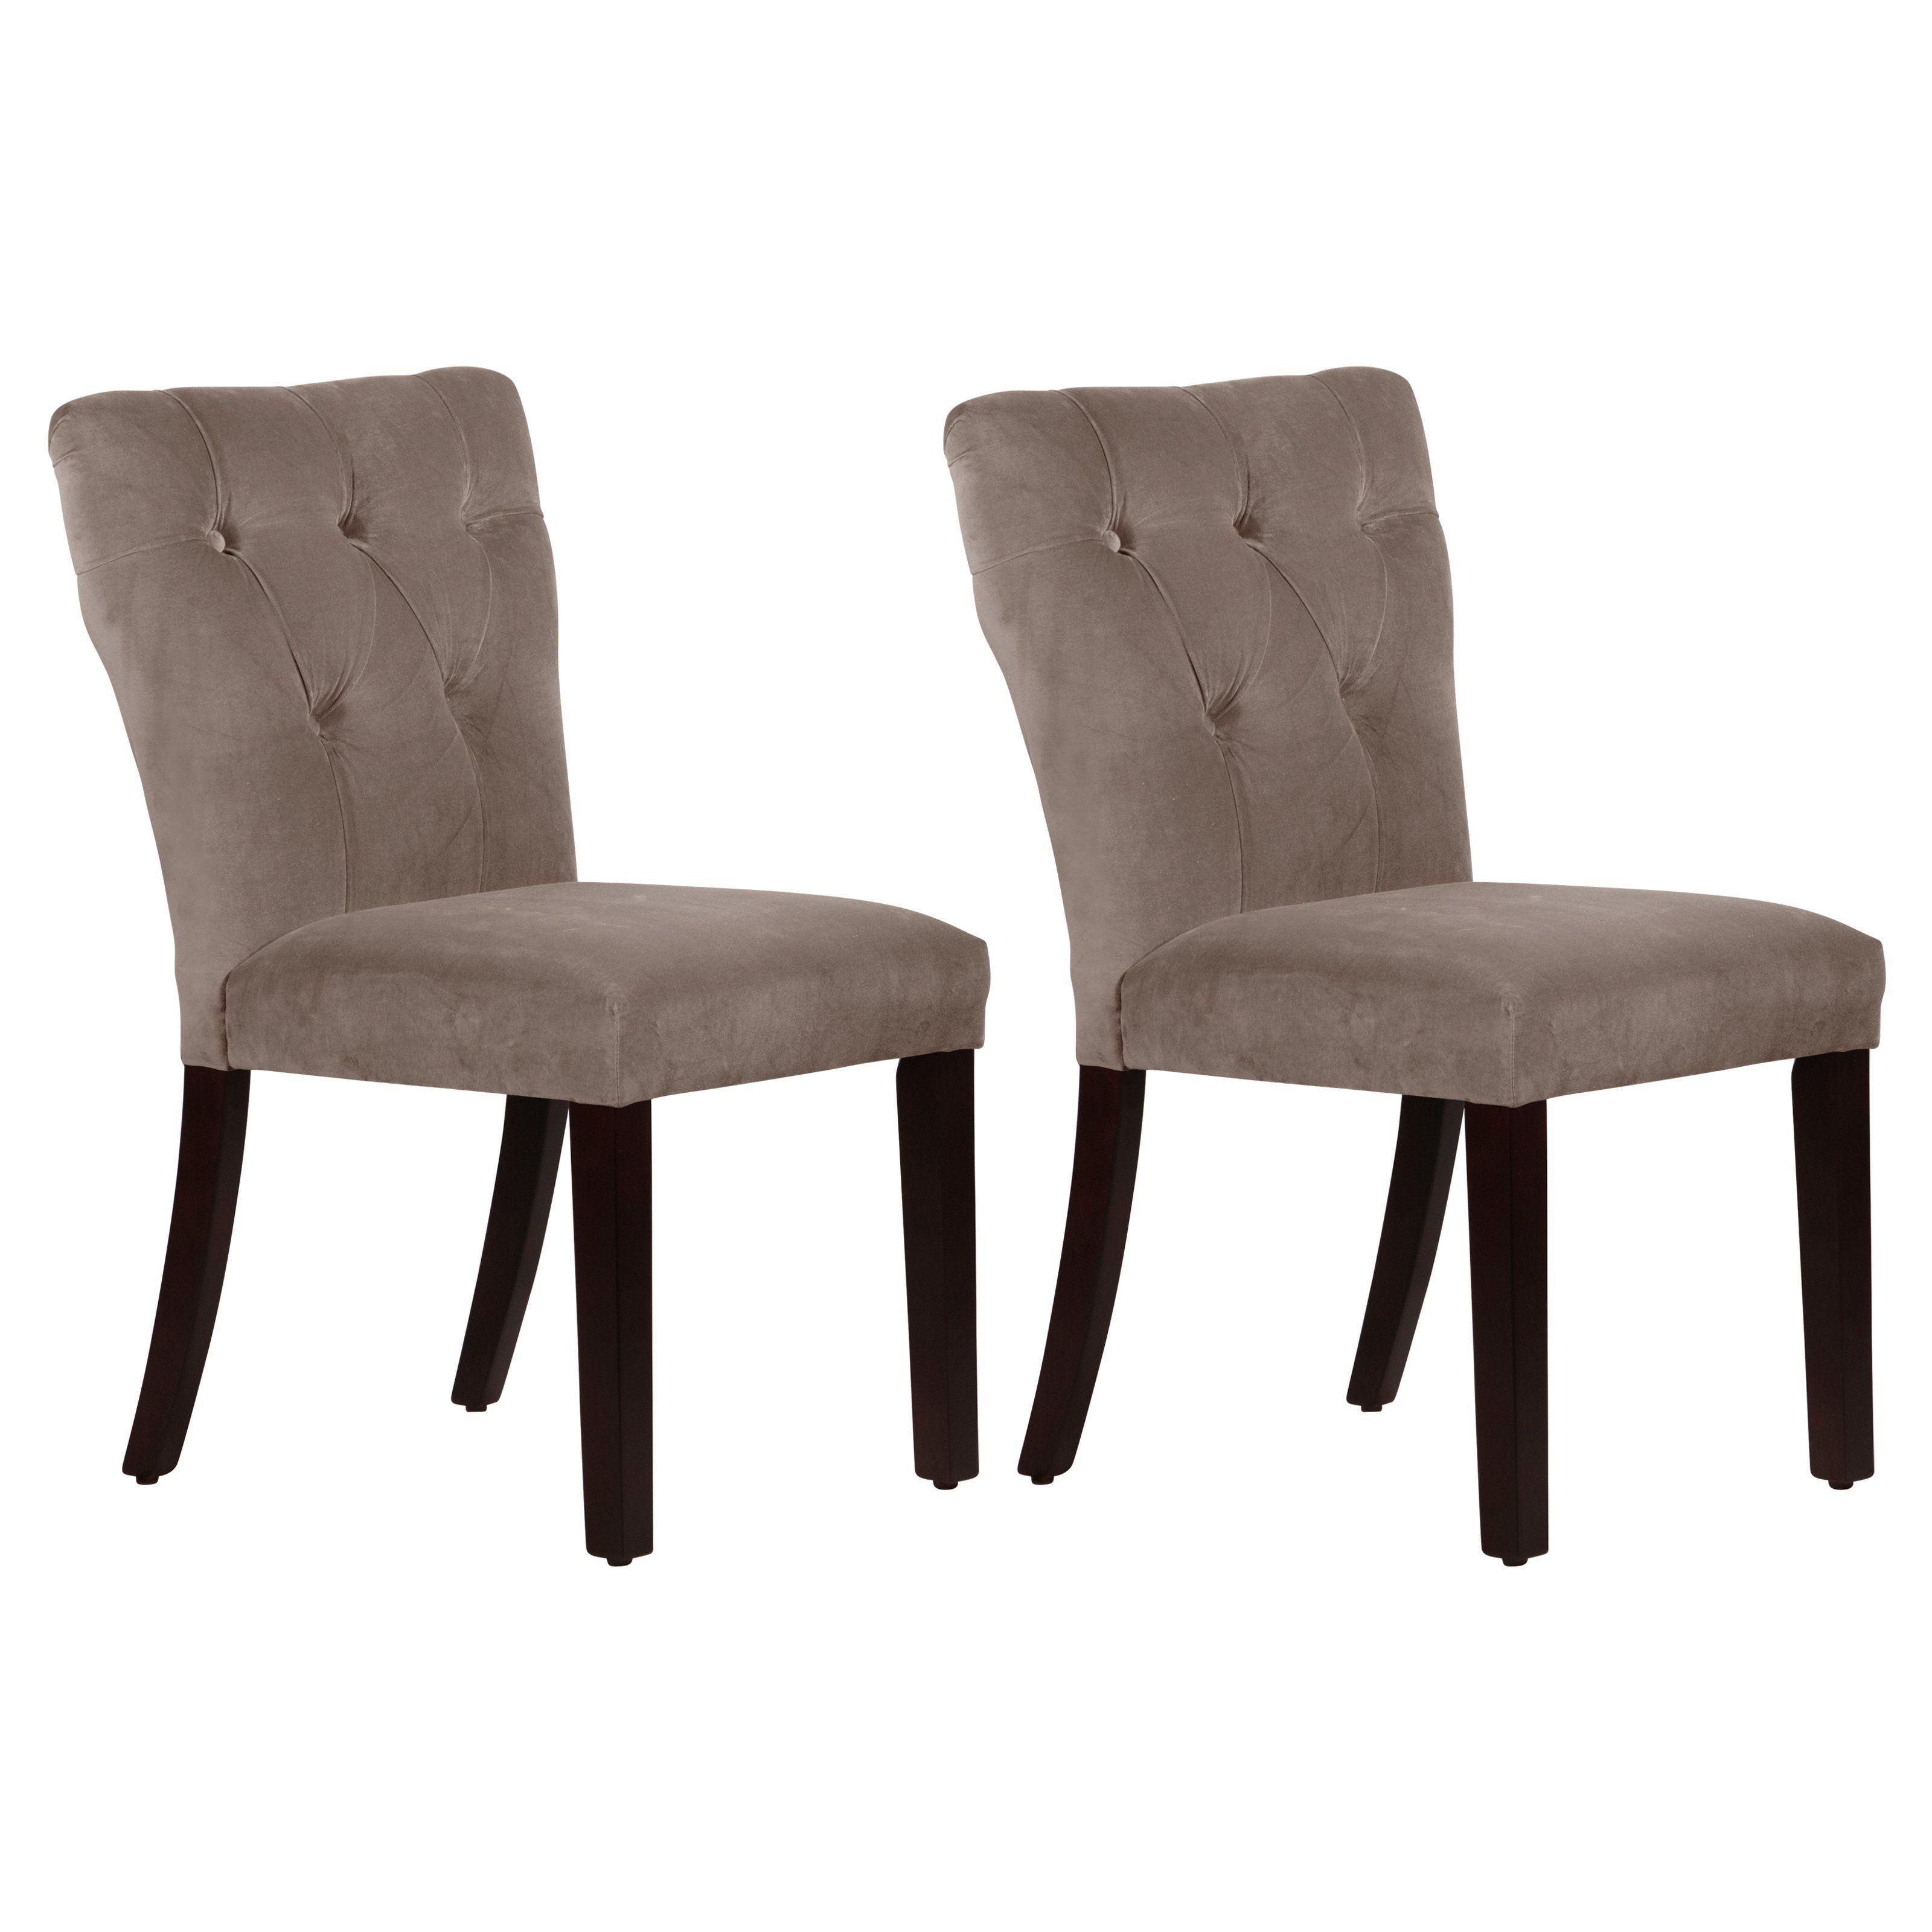 Skyline Tufted Hourgl Dining Chair Set Of 2 65 6esprglsmkset2